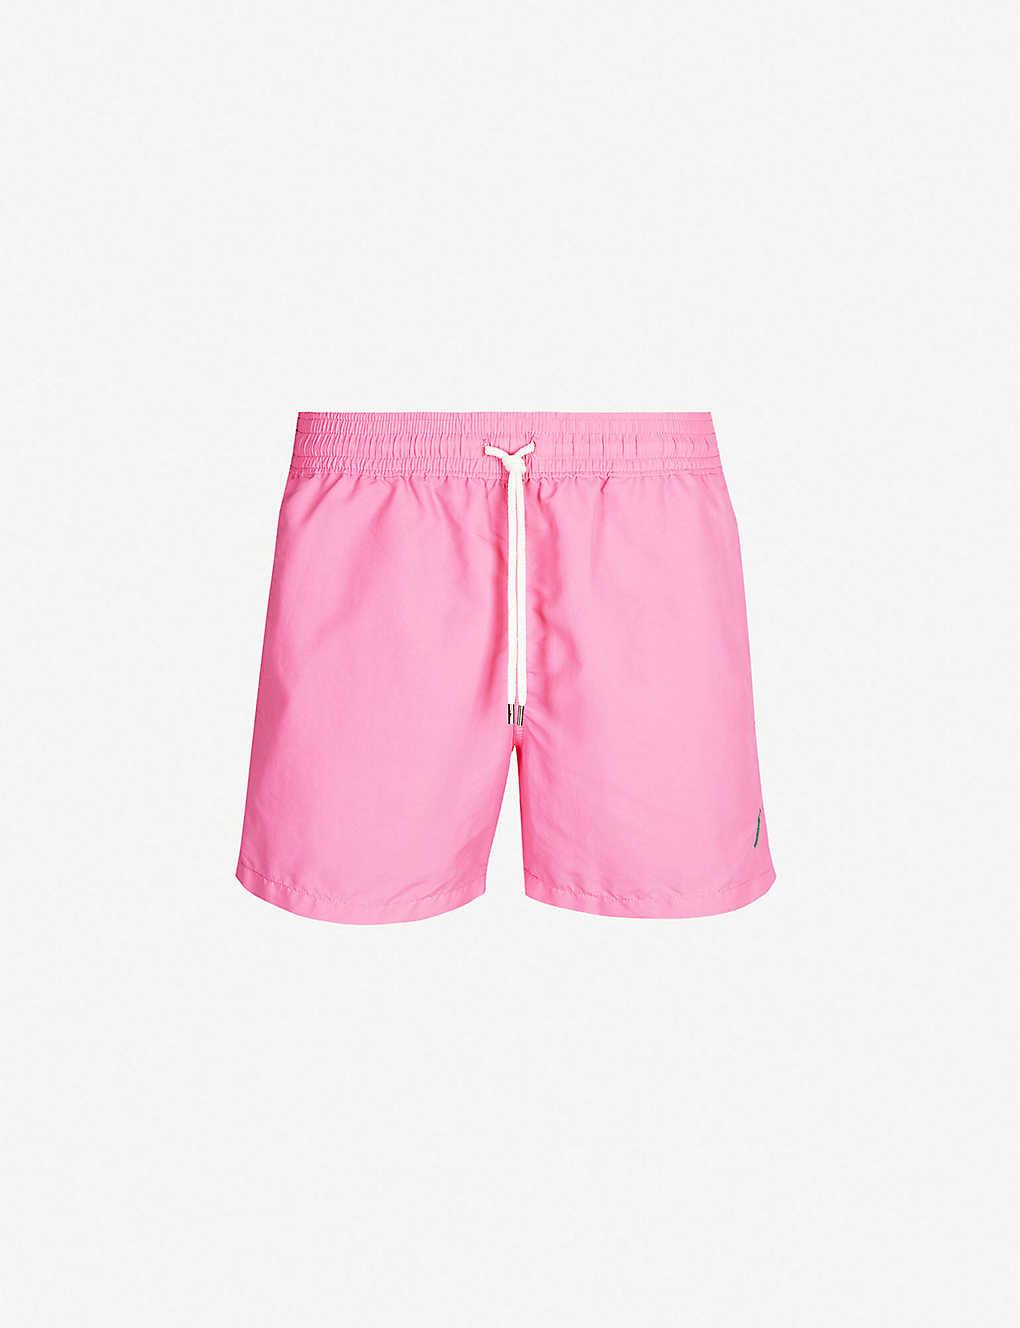 1ec40dfd81 POLO RALPH LAUREN - Traveller Slim mid-rise swim shorts | Selfridges.com